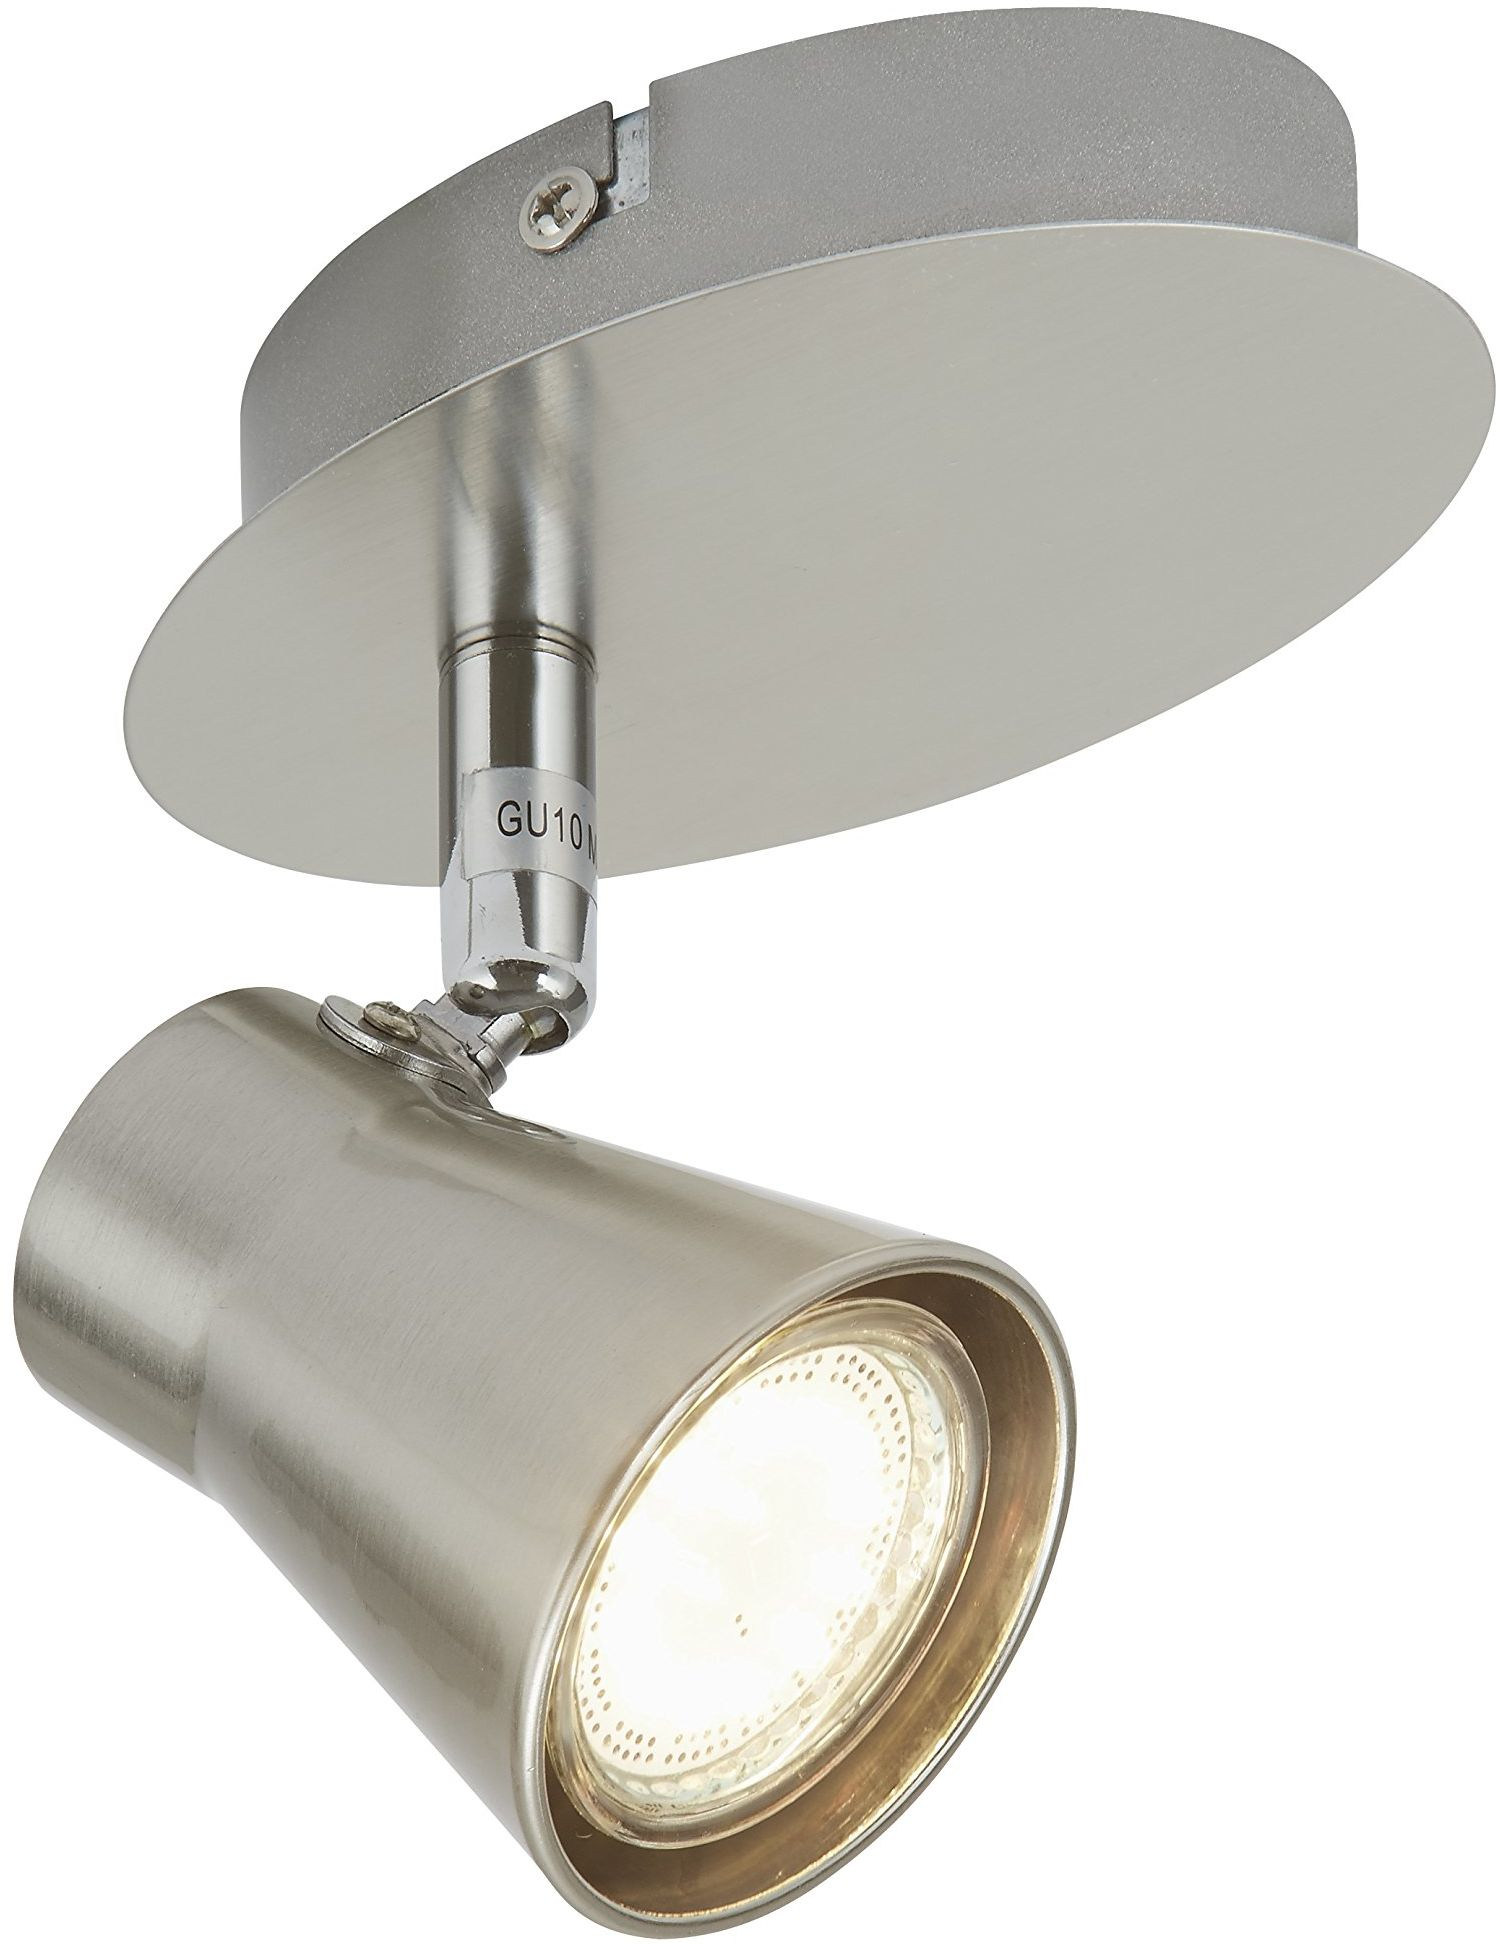 Briloner Leuchten lampa ścienna LED, lampa ścienna, lampa sufitowa, reflektor LED, lampa do salonu, lampa sufitowa, reflektor sufitowy, lampa sufitowa